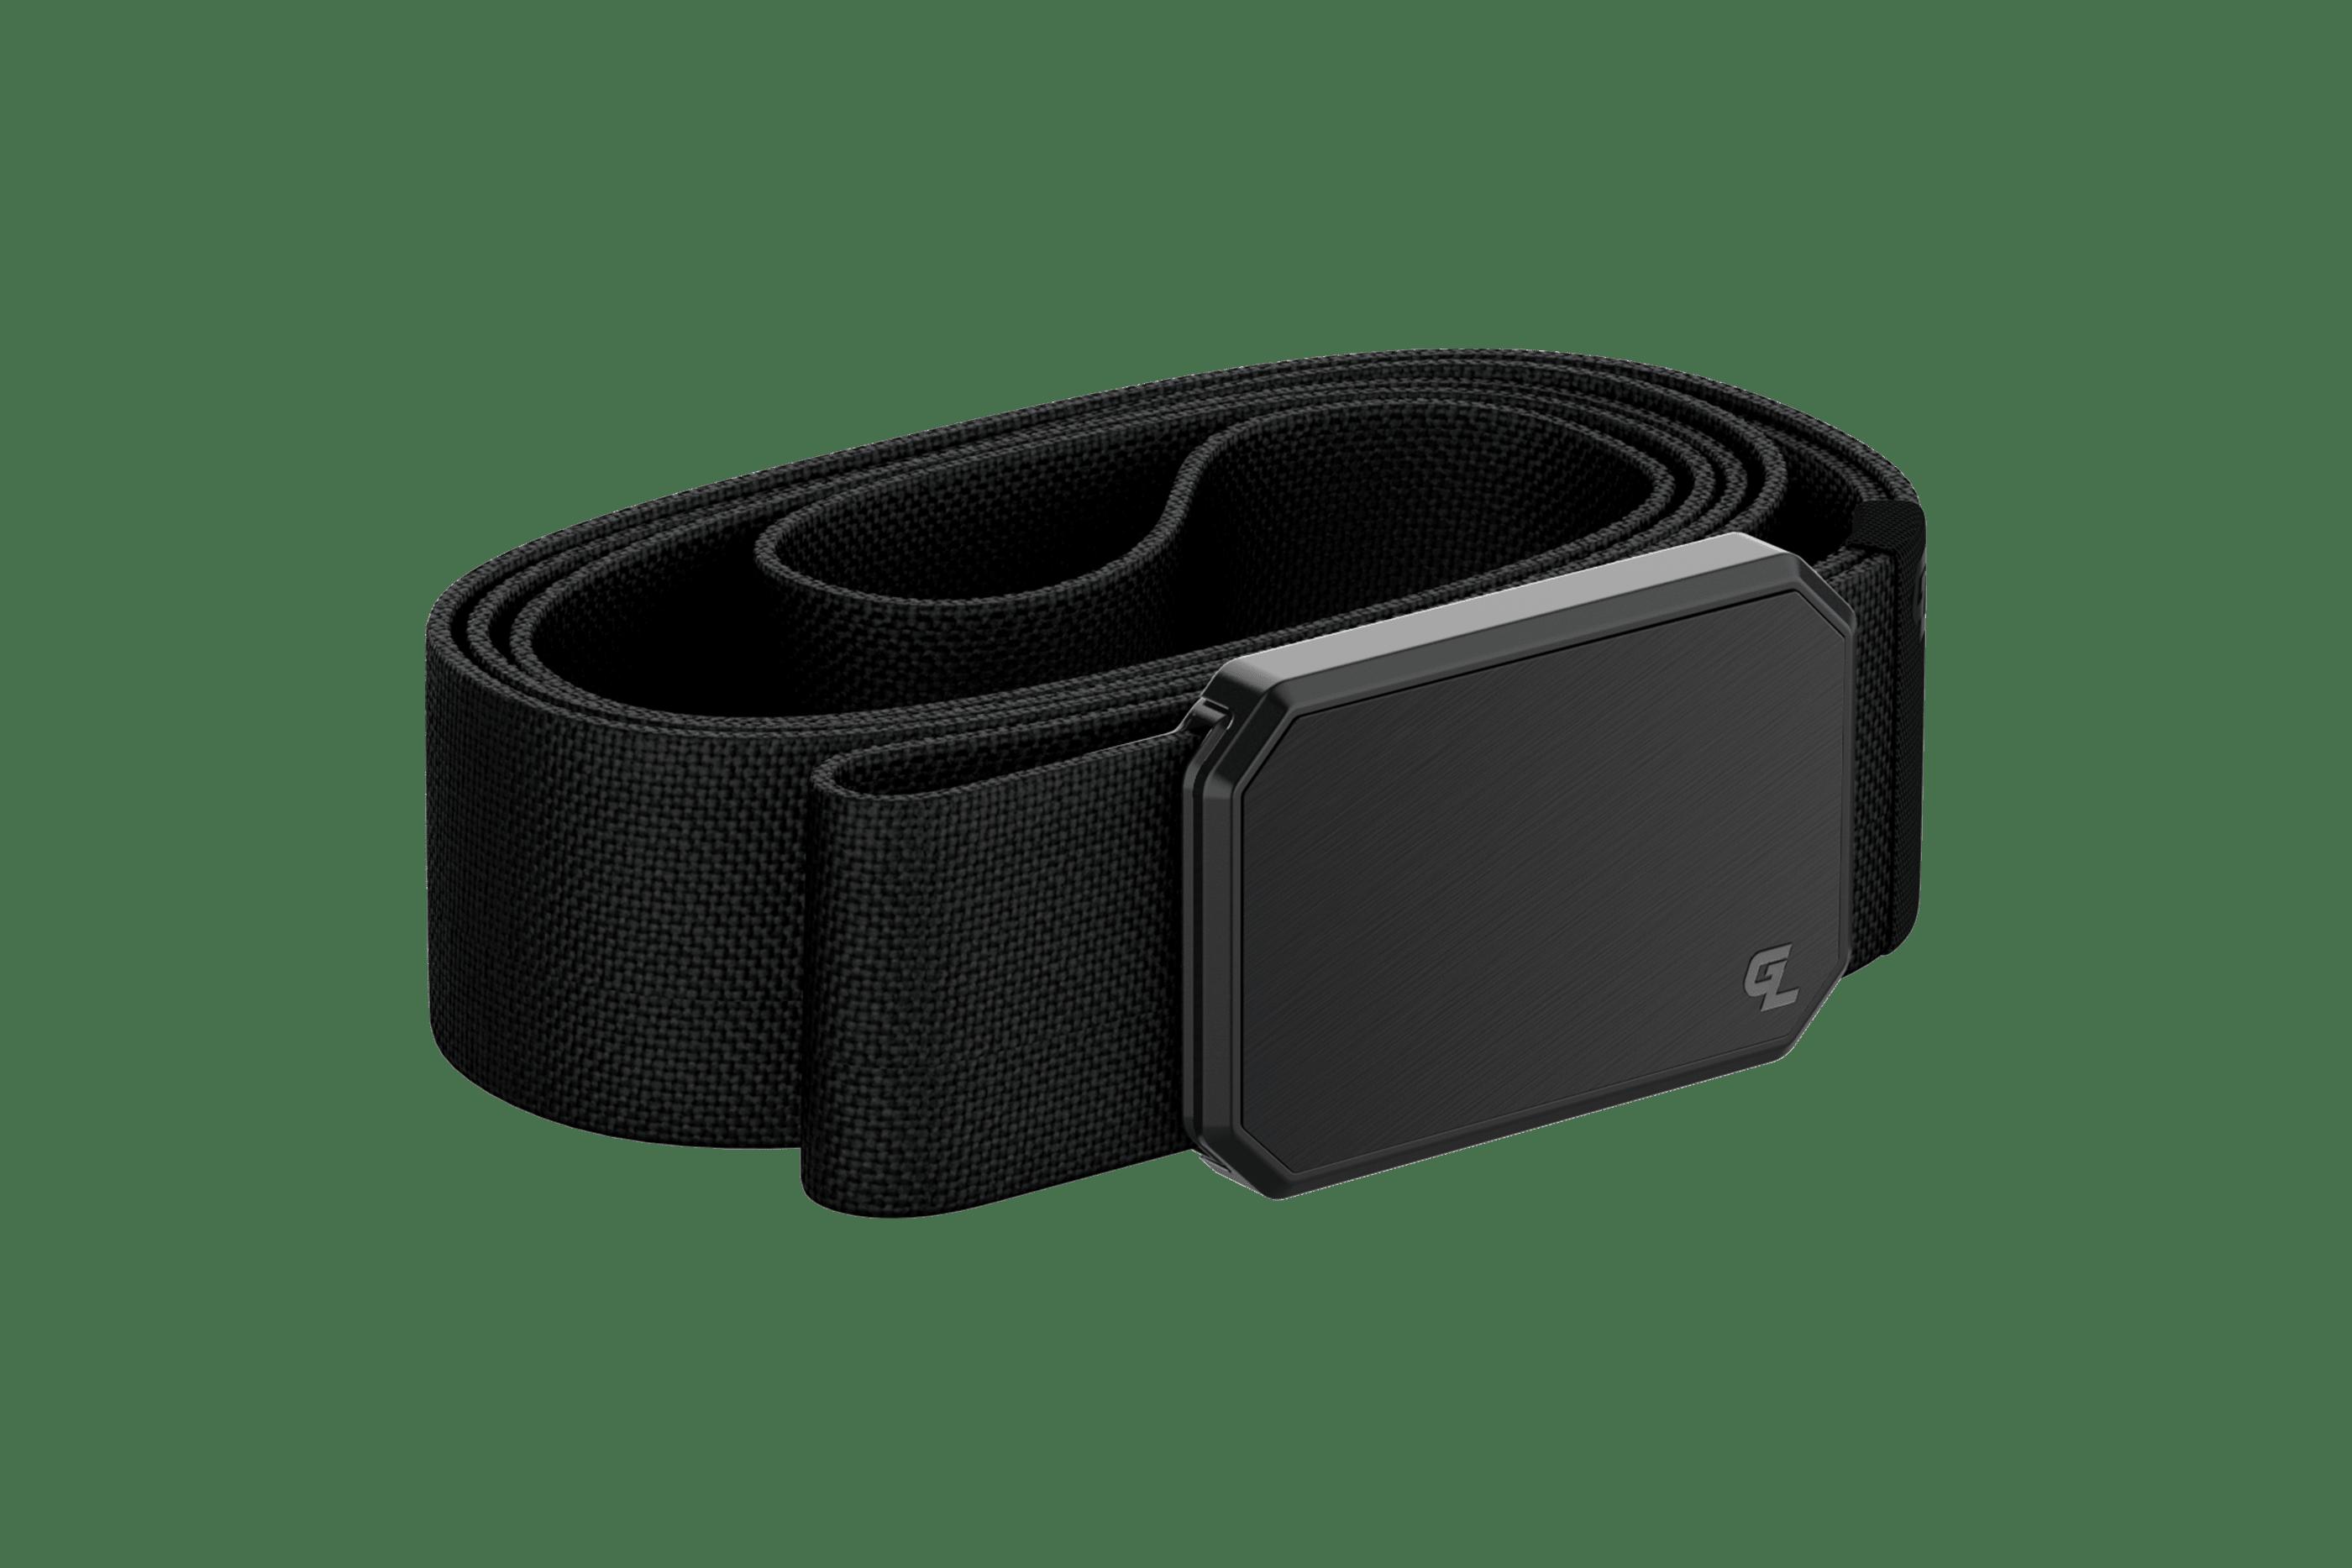 Groove Belt Black/Black  viewed from side